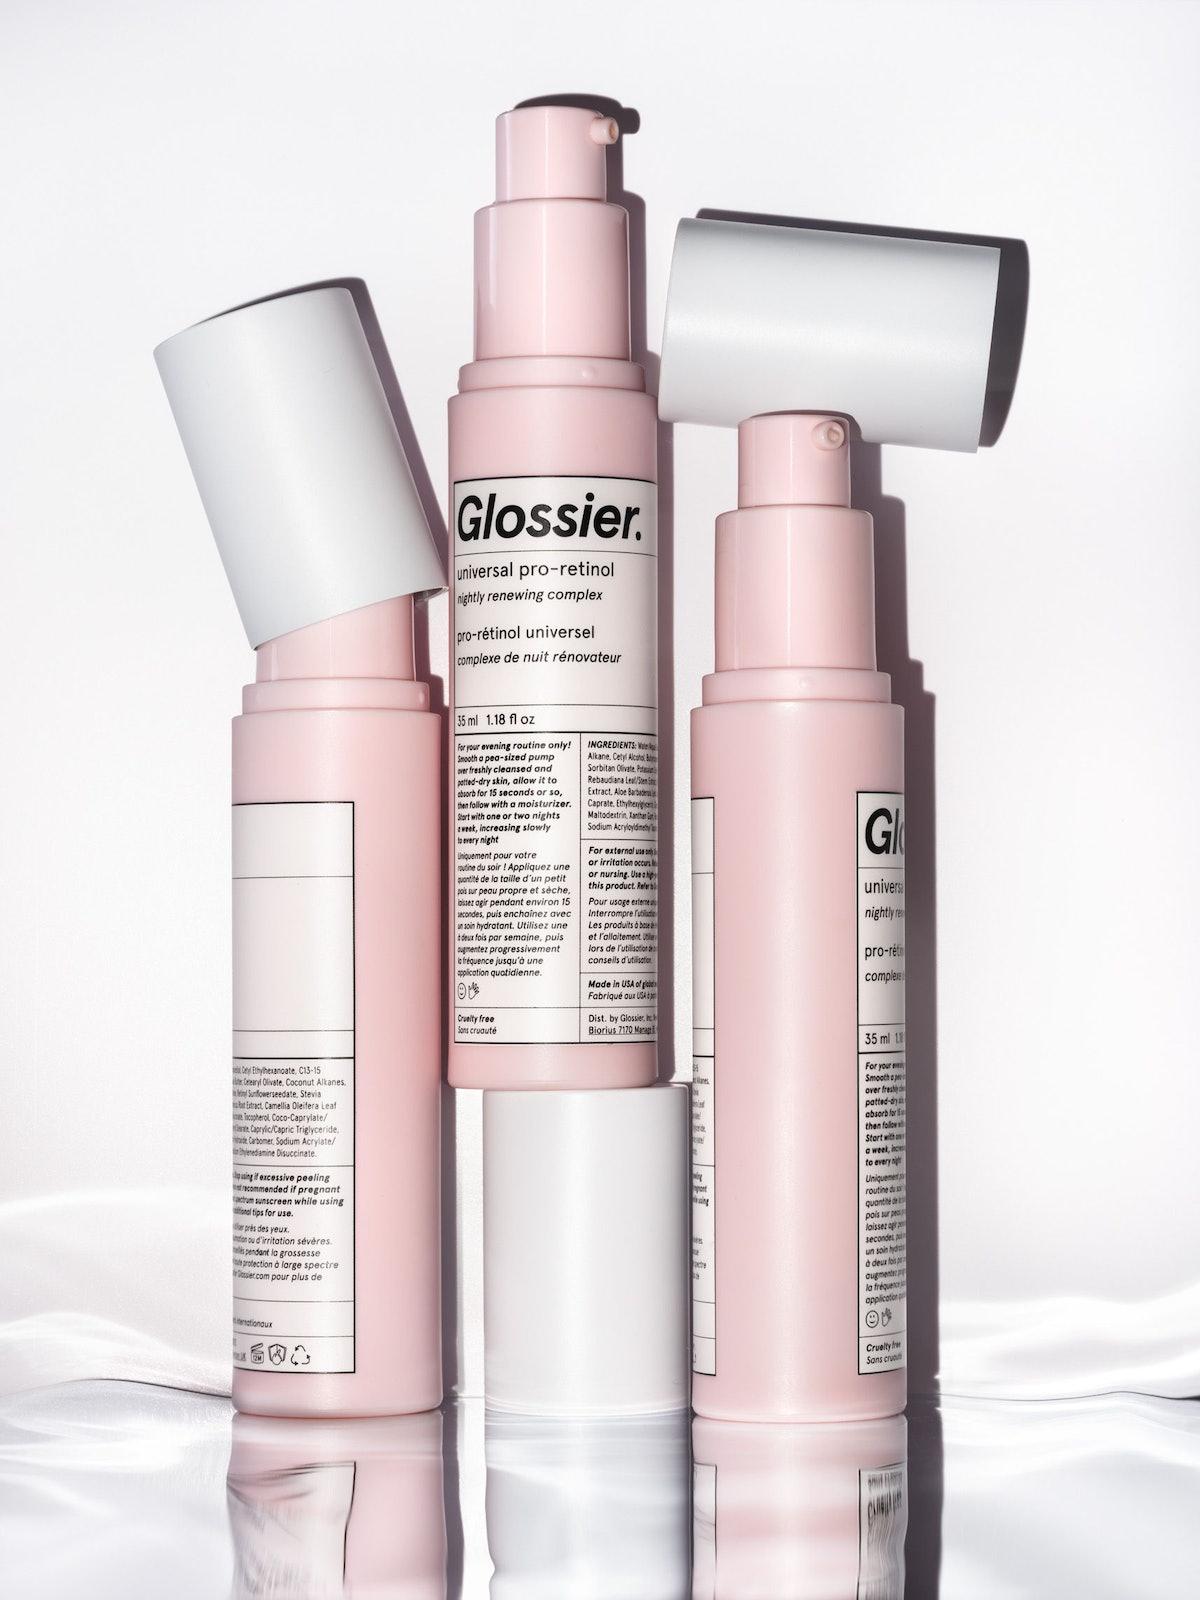 Glossier Universal Pro-Retinol bottles stacked up stylistically